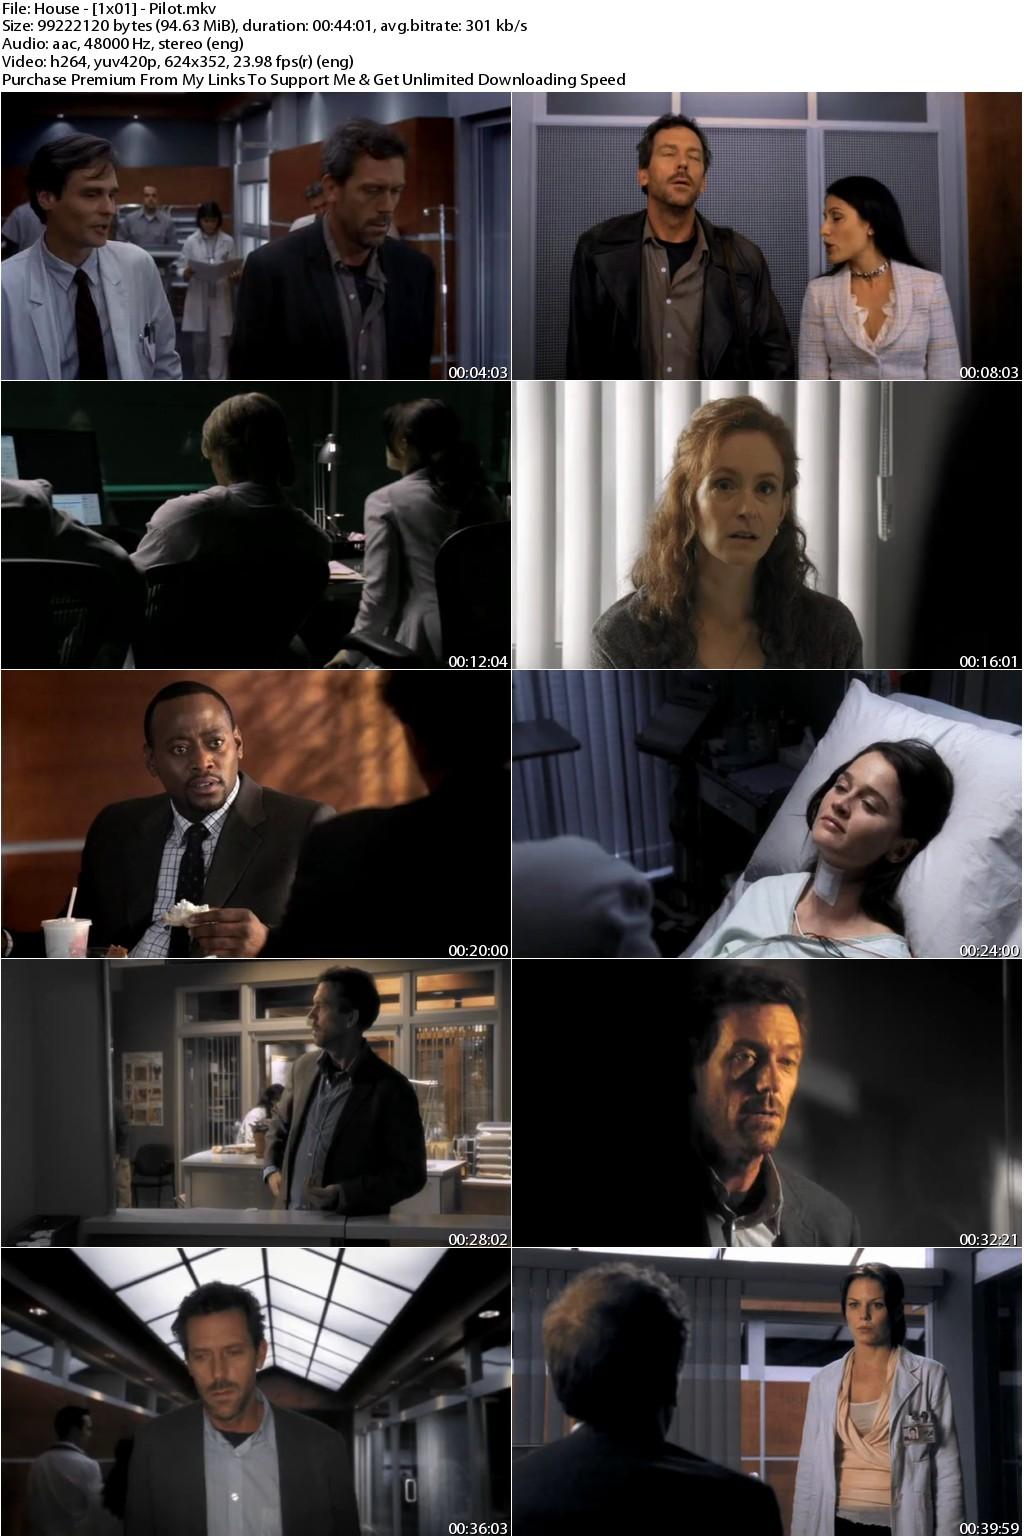 House M.D. Season 2 Complete 720p WEBDL x265 HEVC 5.5GB-Qman UTR